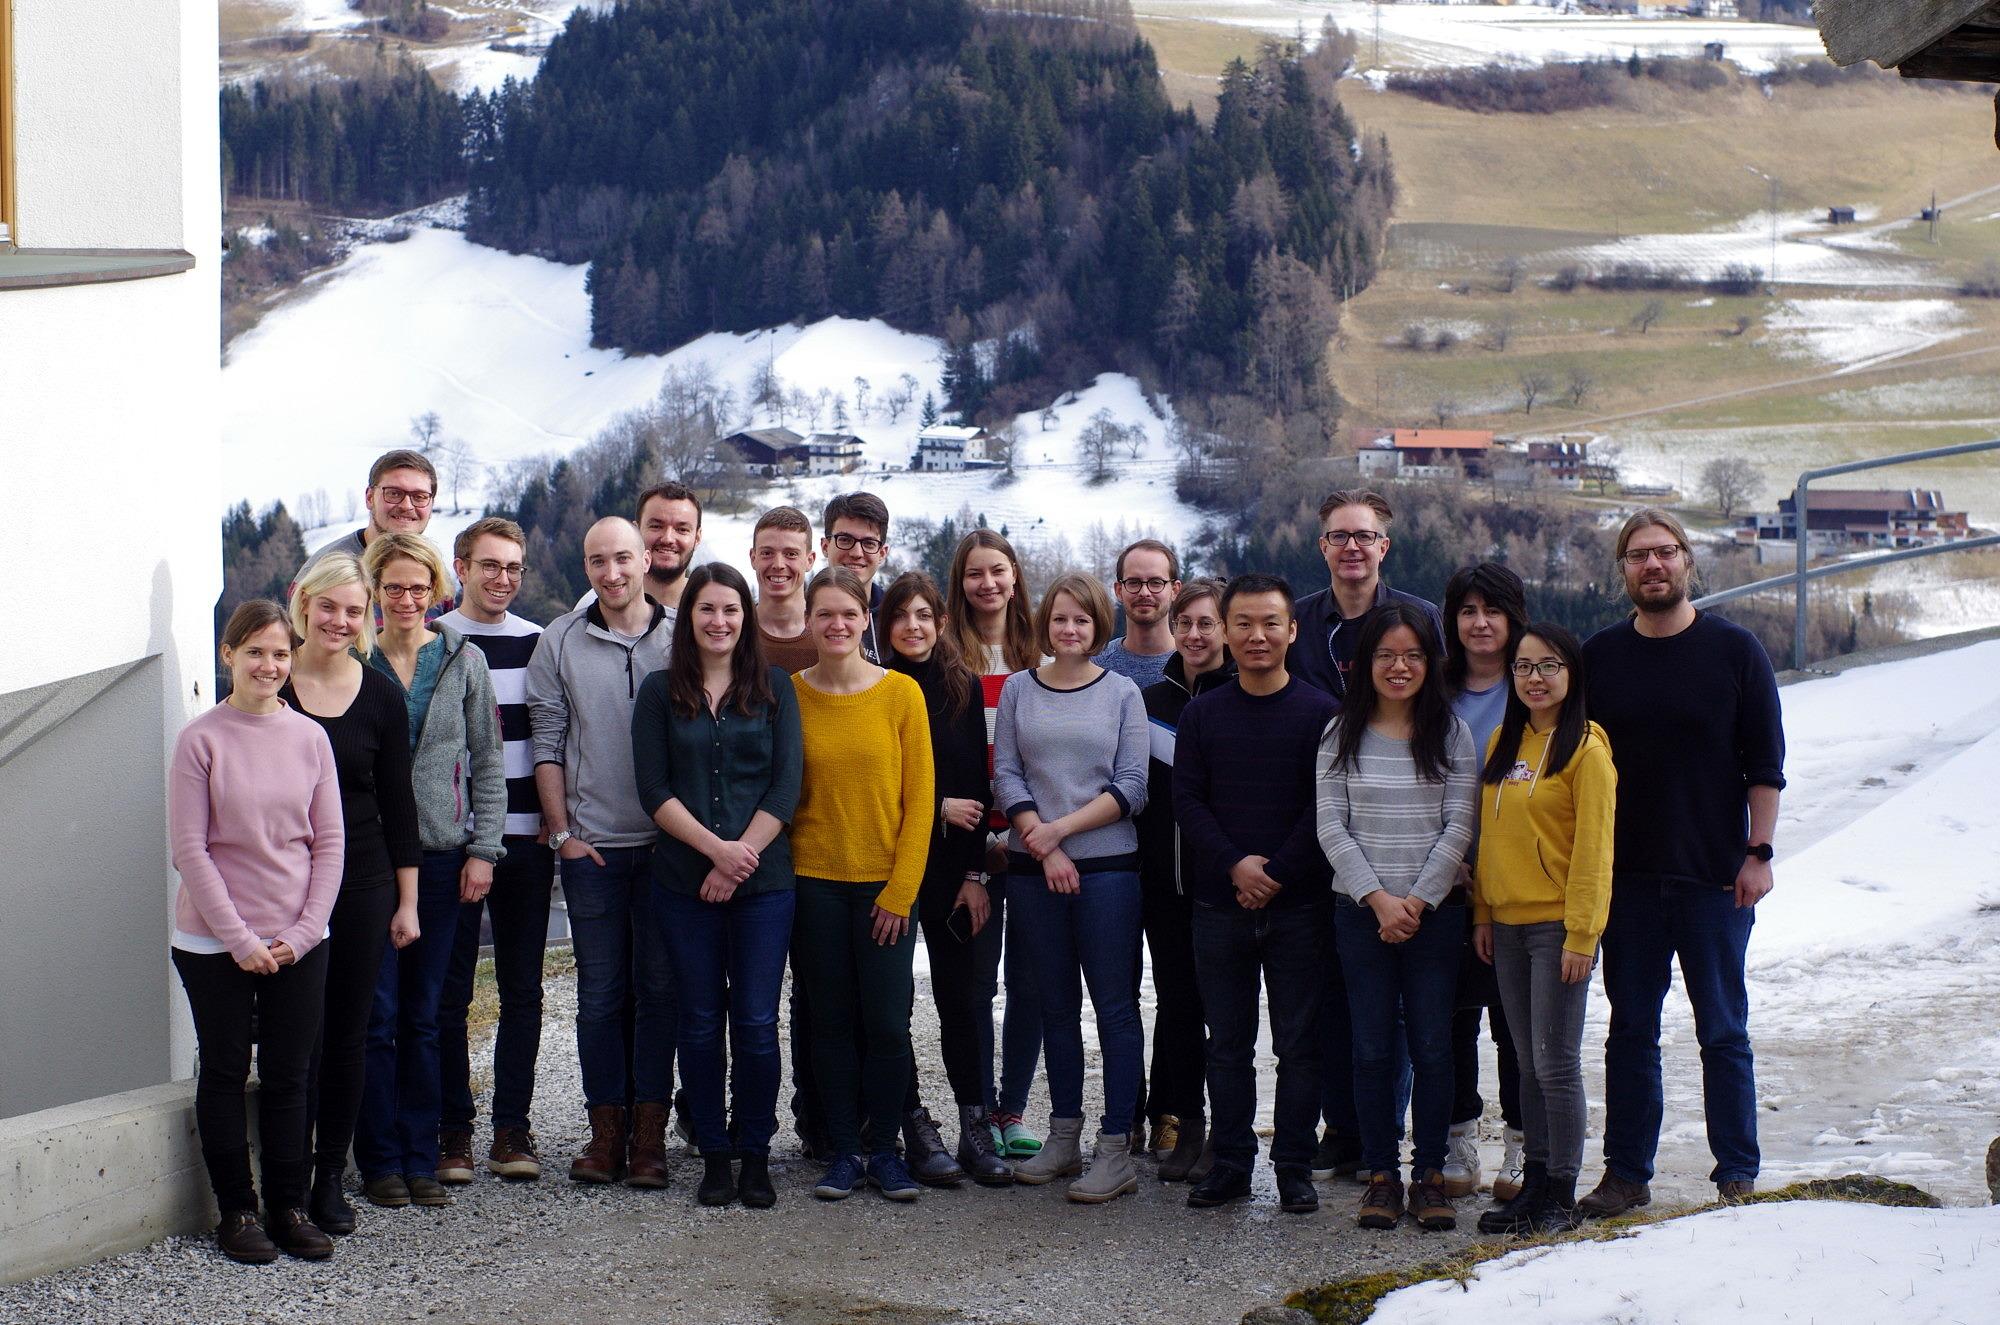 Libuda Group, Schönberg 2020 - (With guests: Prof. Julia Kunze-Liebhäuser, Eva-Maria Wernig, Andrea Auer, Dr. Tao Xu) (image: FAU)